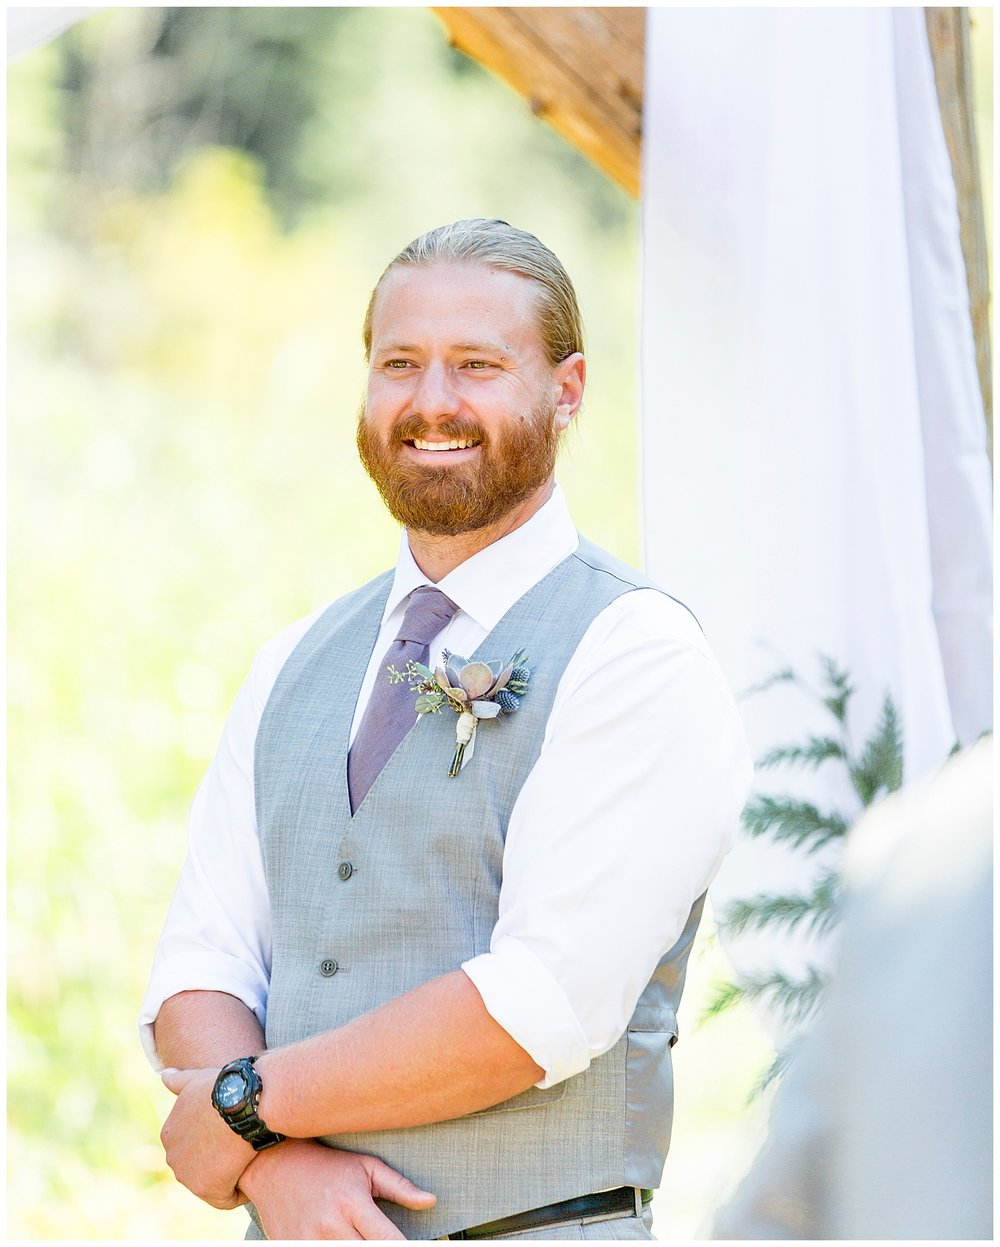 Wedding_Easton_Washington_Whistling_Dixie_Photography_Summer_River_Cabin_0035.jpg